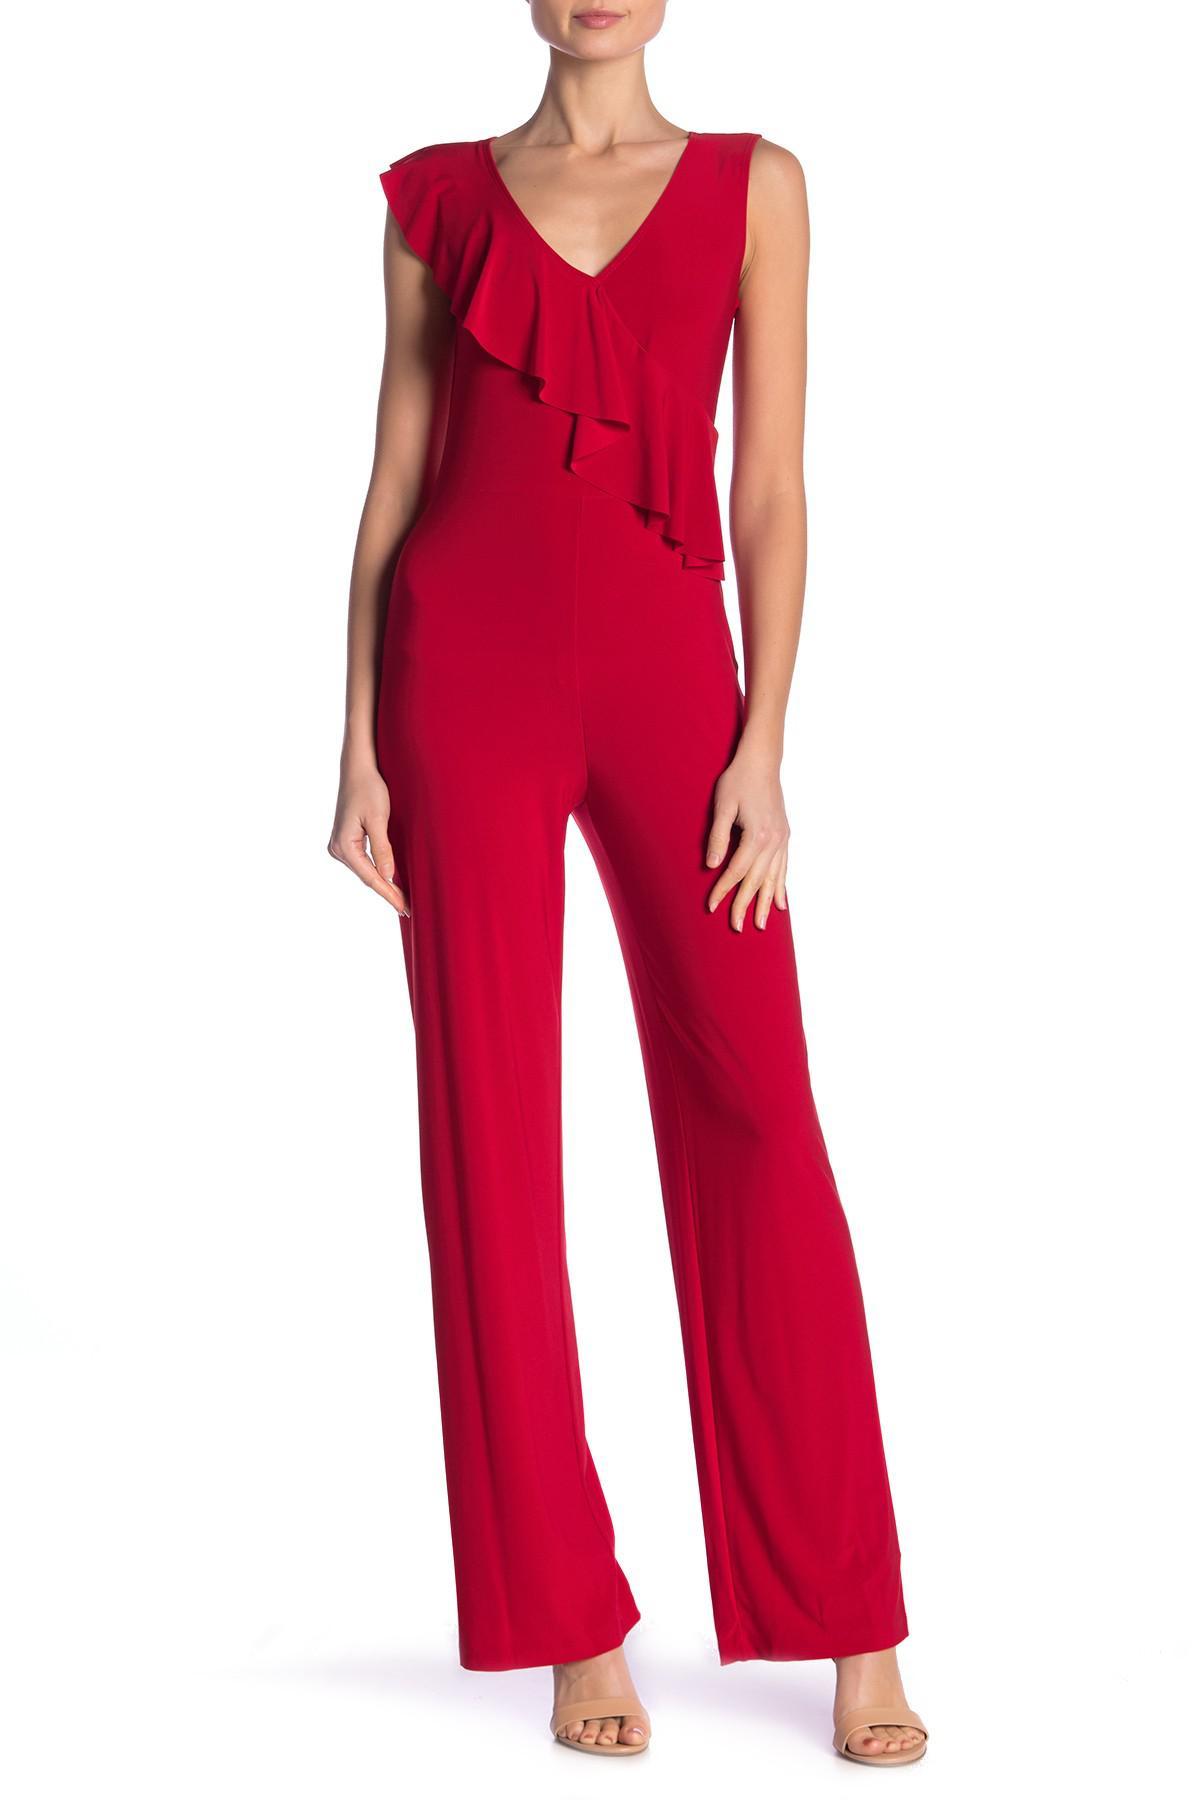 579d365b0e2f3 Lyst - Bebe Cascade Ruffle Jumpsuit in Red